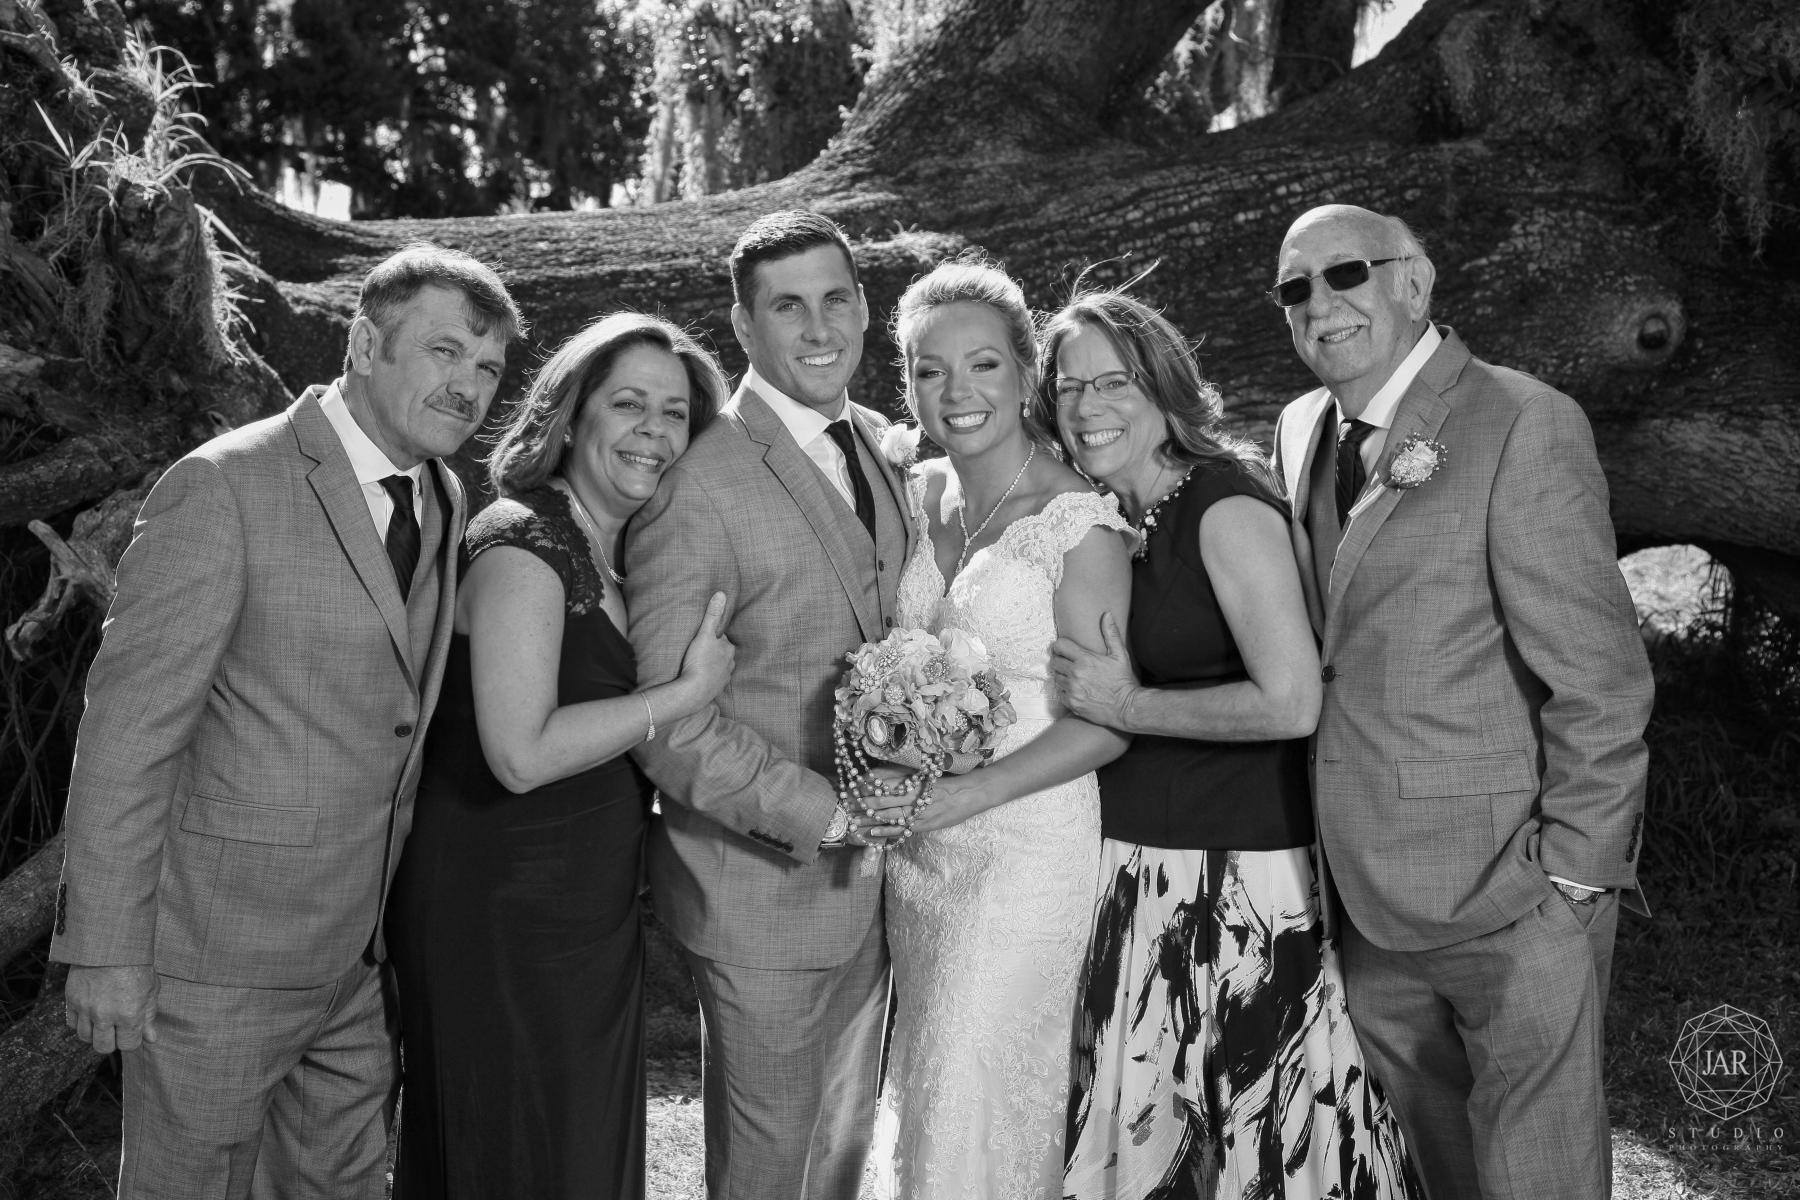 14-family-wedding-formals-park-tree-orlando-florida-jarstudio.JPG